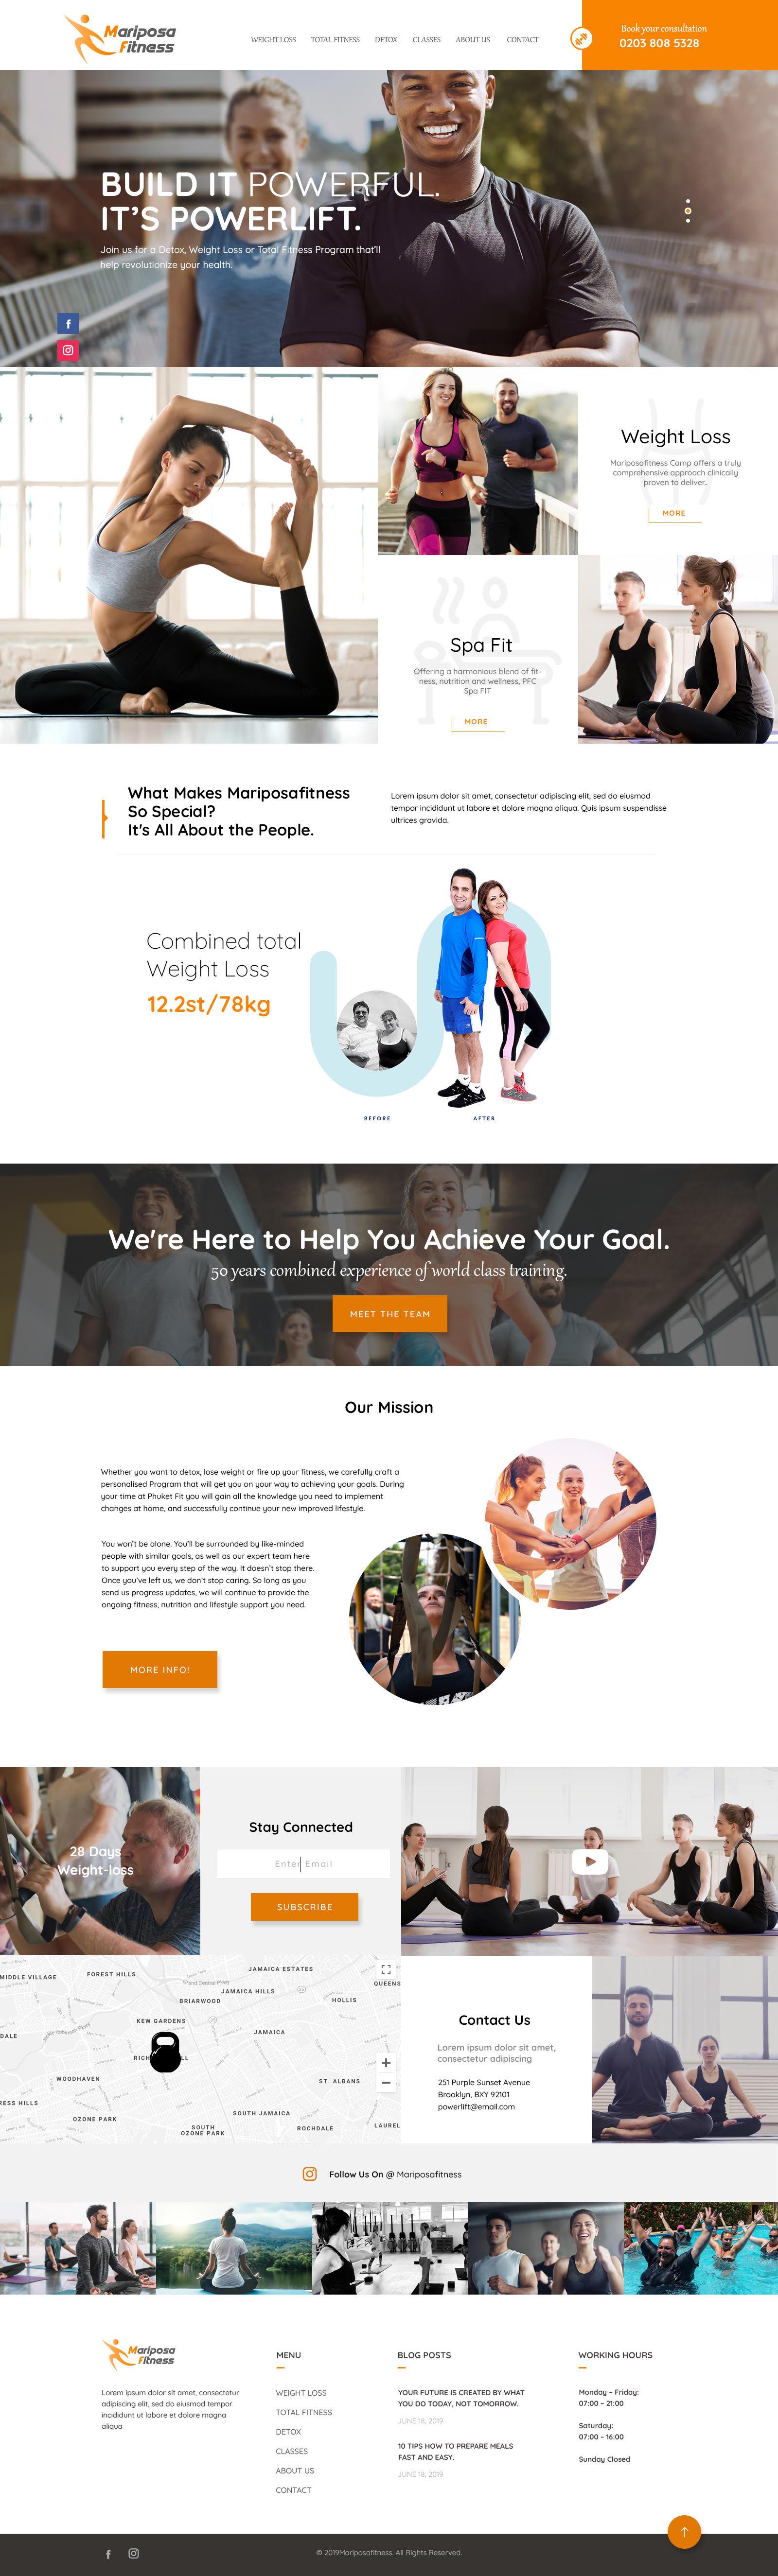 60761mariposa-fitness.jpg